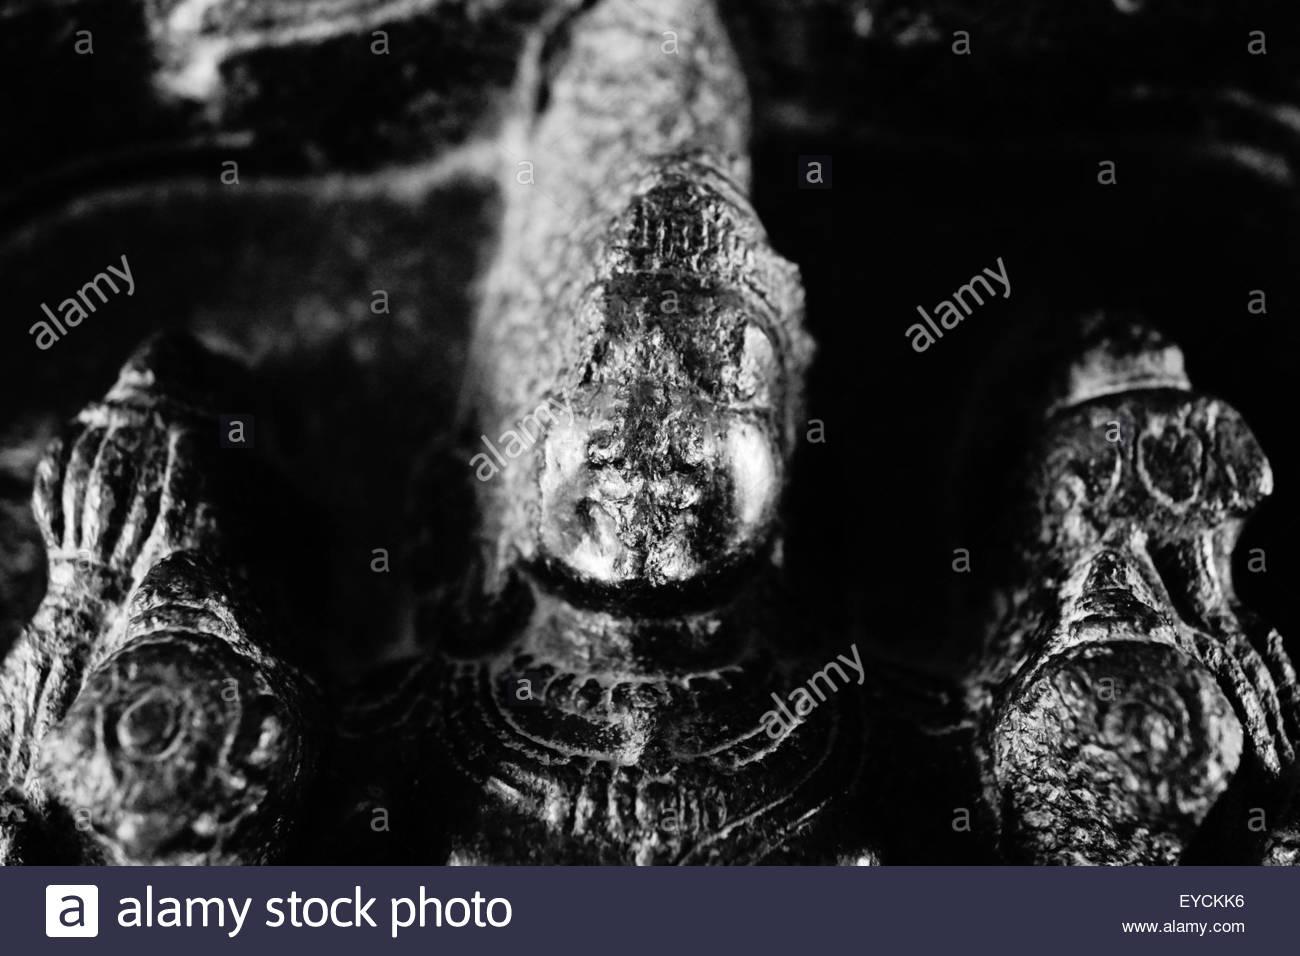 A Hindu deity at the Krishna Temple in Hampi, India. - Stock Image